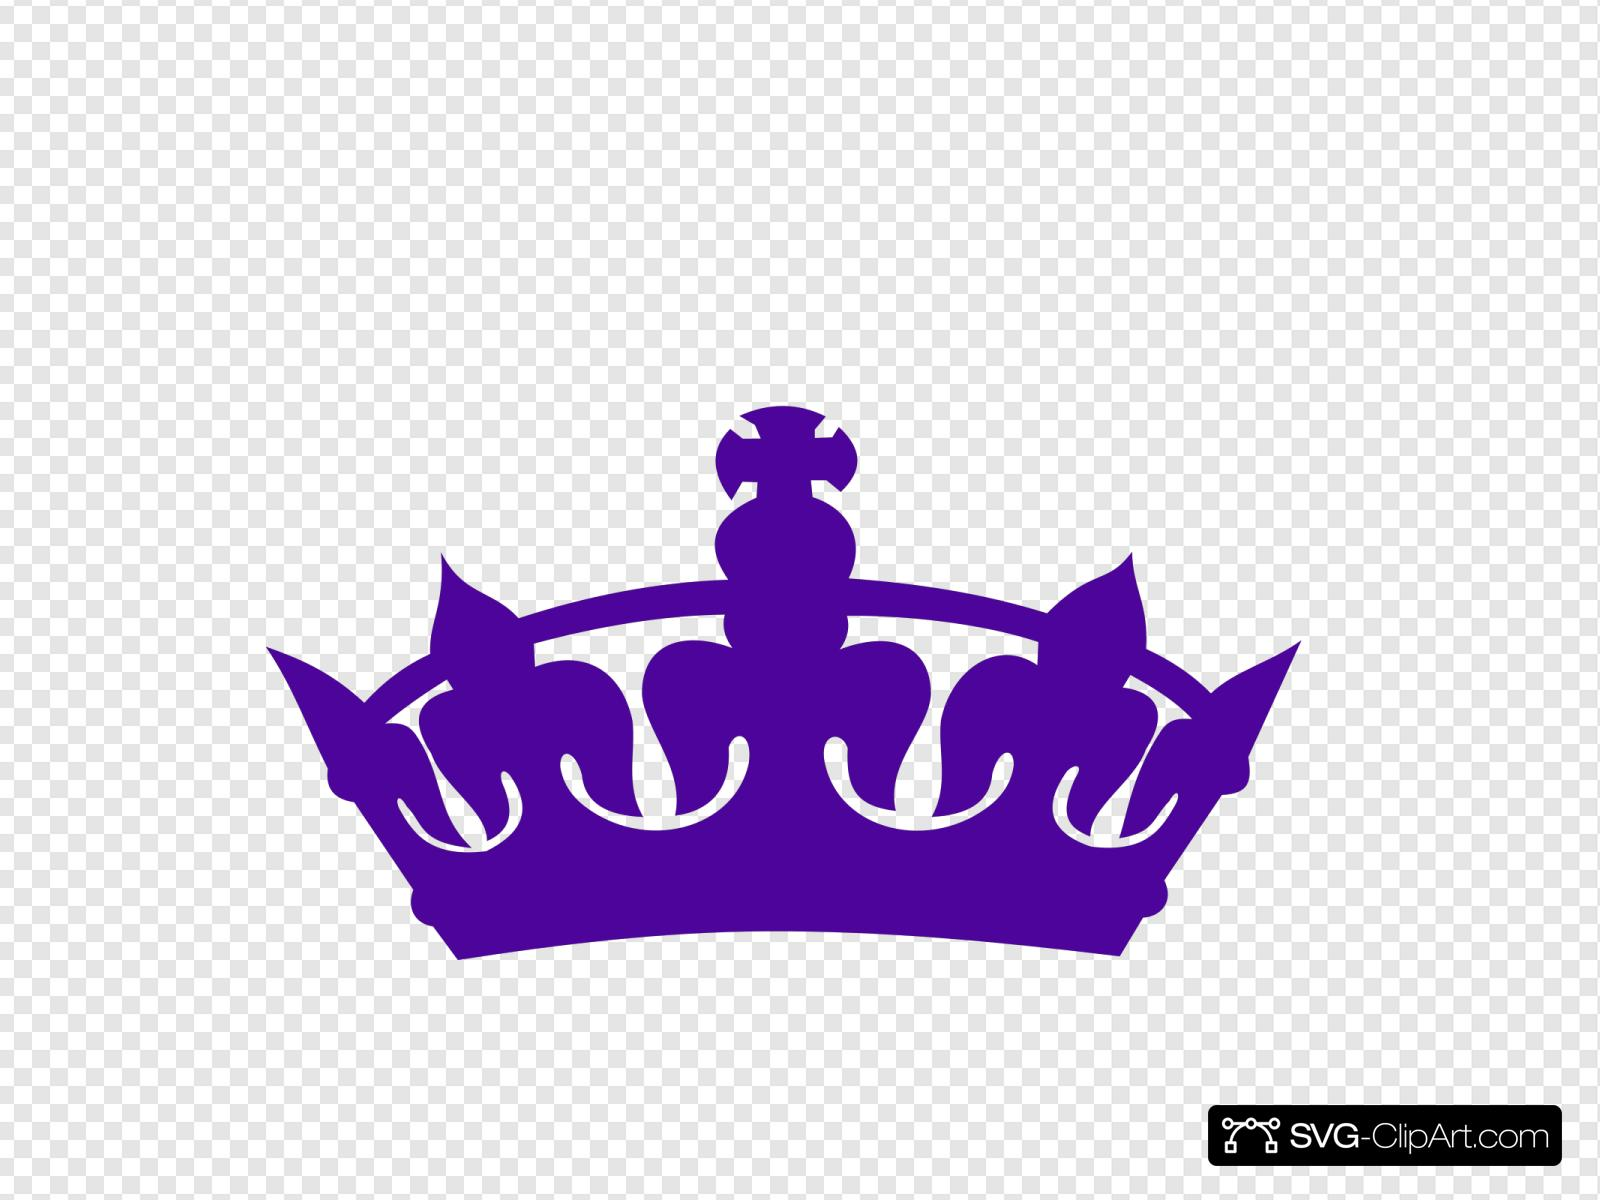 Purple crown. Clip art icon and